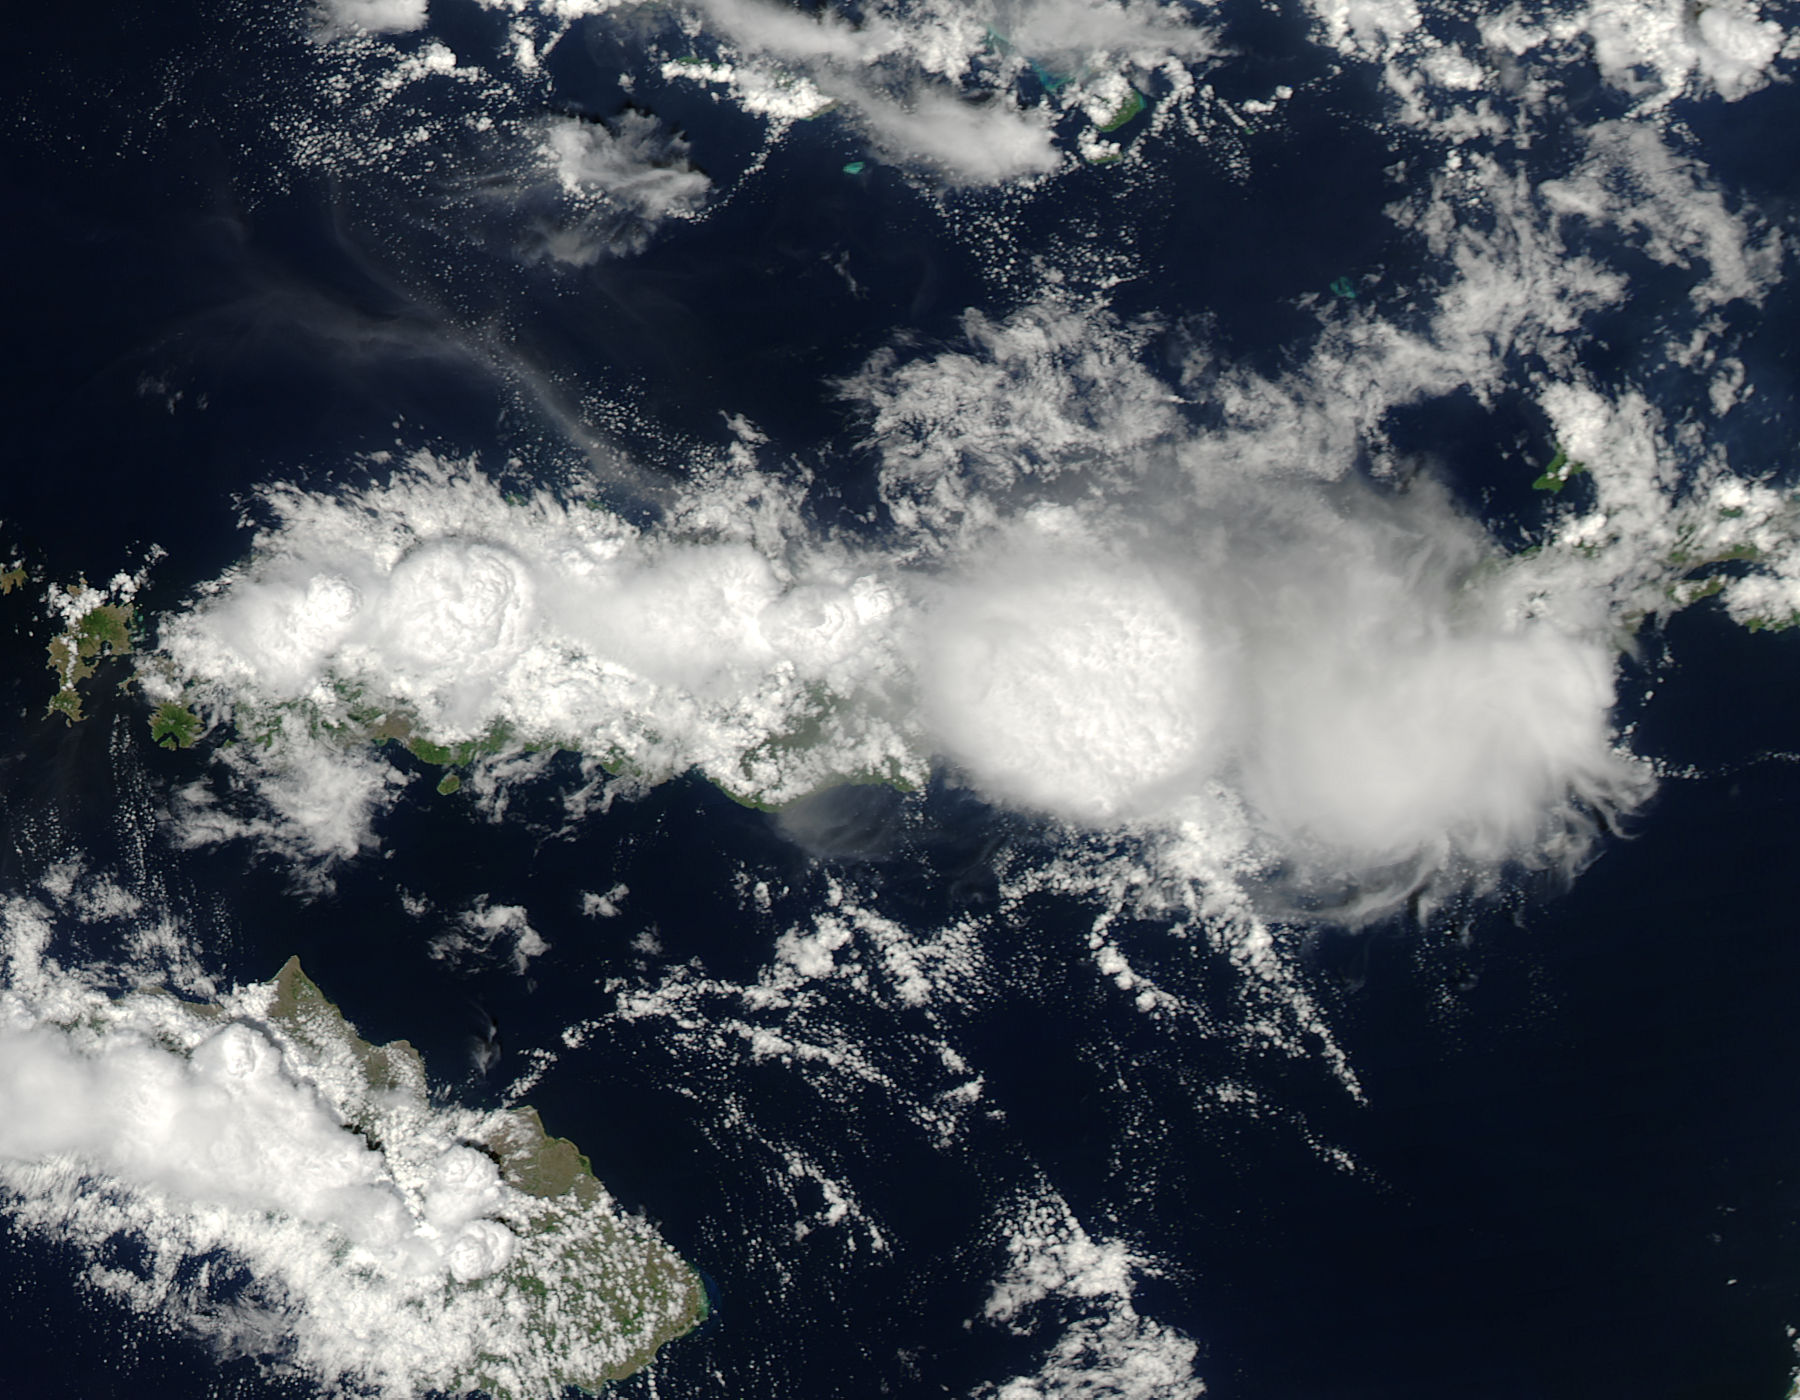 Image: Aqua satellite captures striking cloud towers